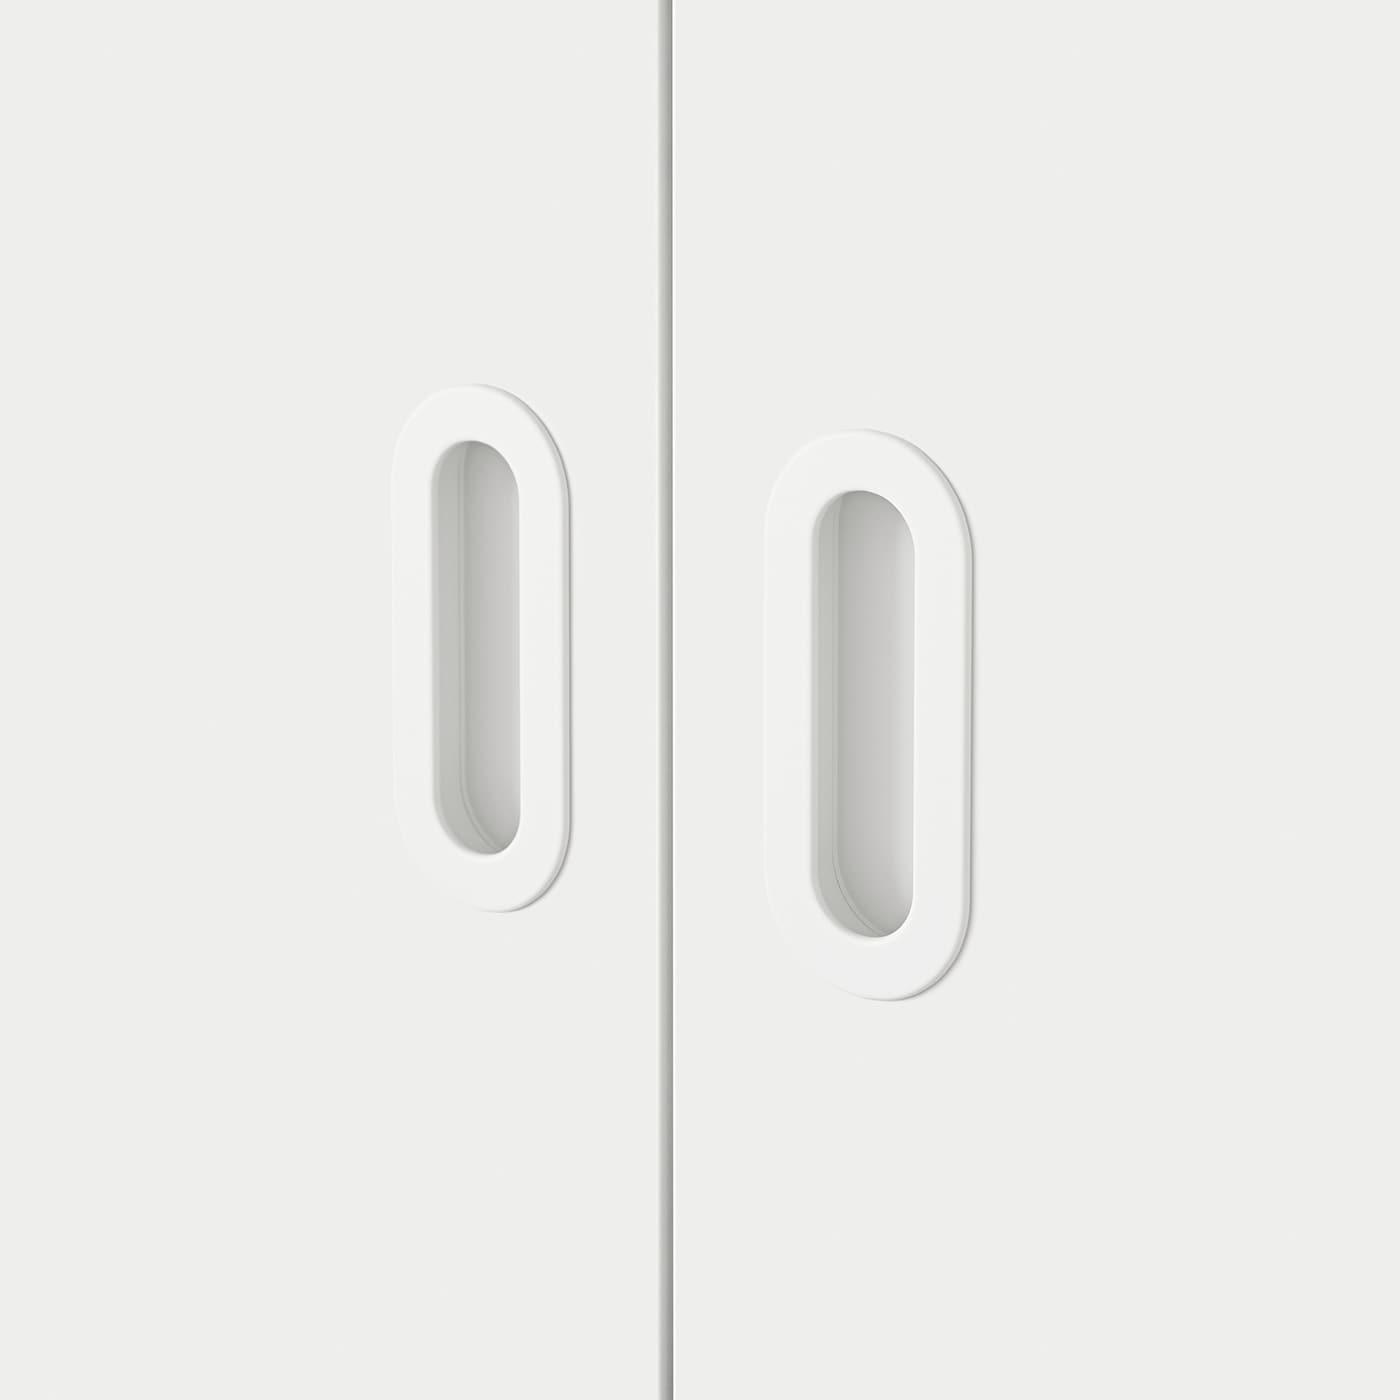 FRITIDS dveře bílá 60.0 cm 64.0 cm 2 ks